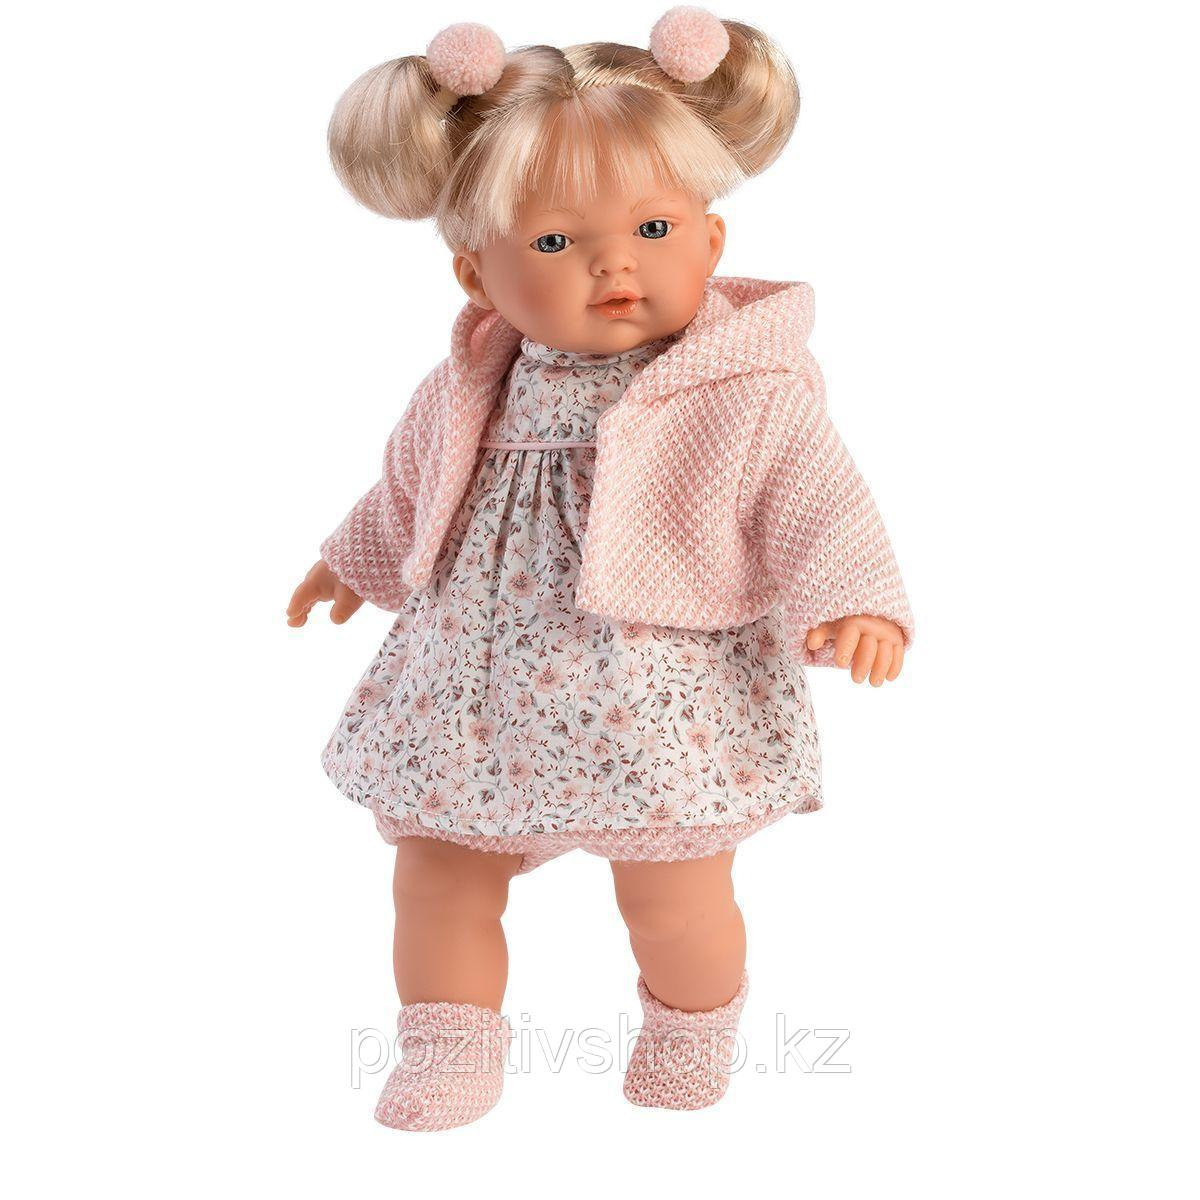 Кукла Llorens Роберта 33 см. блондинка в светло-розовом жакете - фото 1